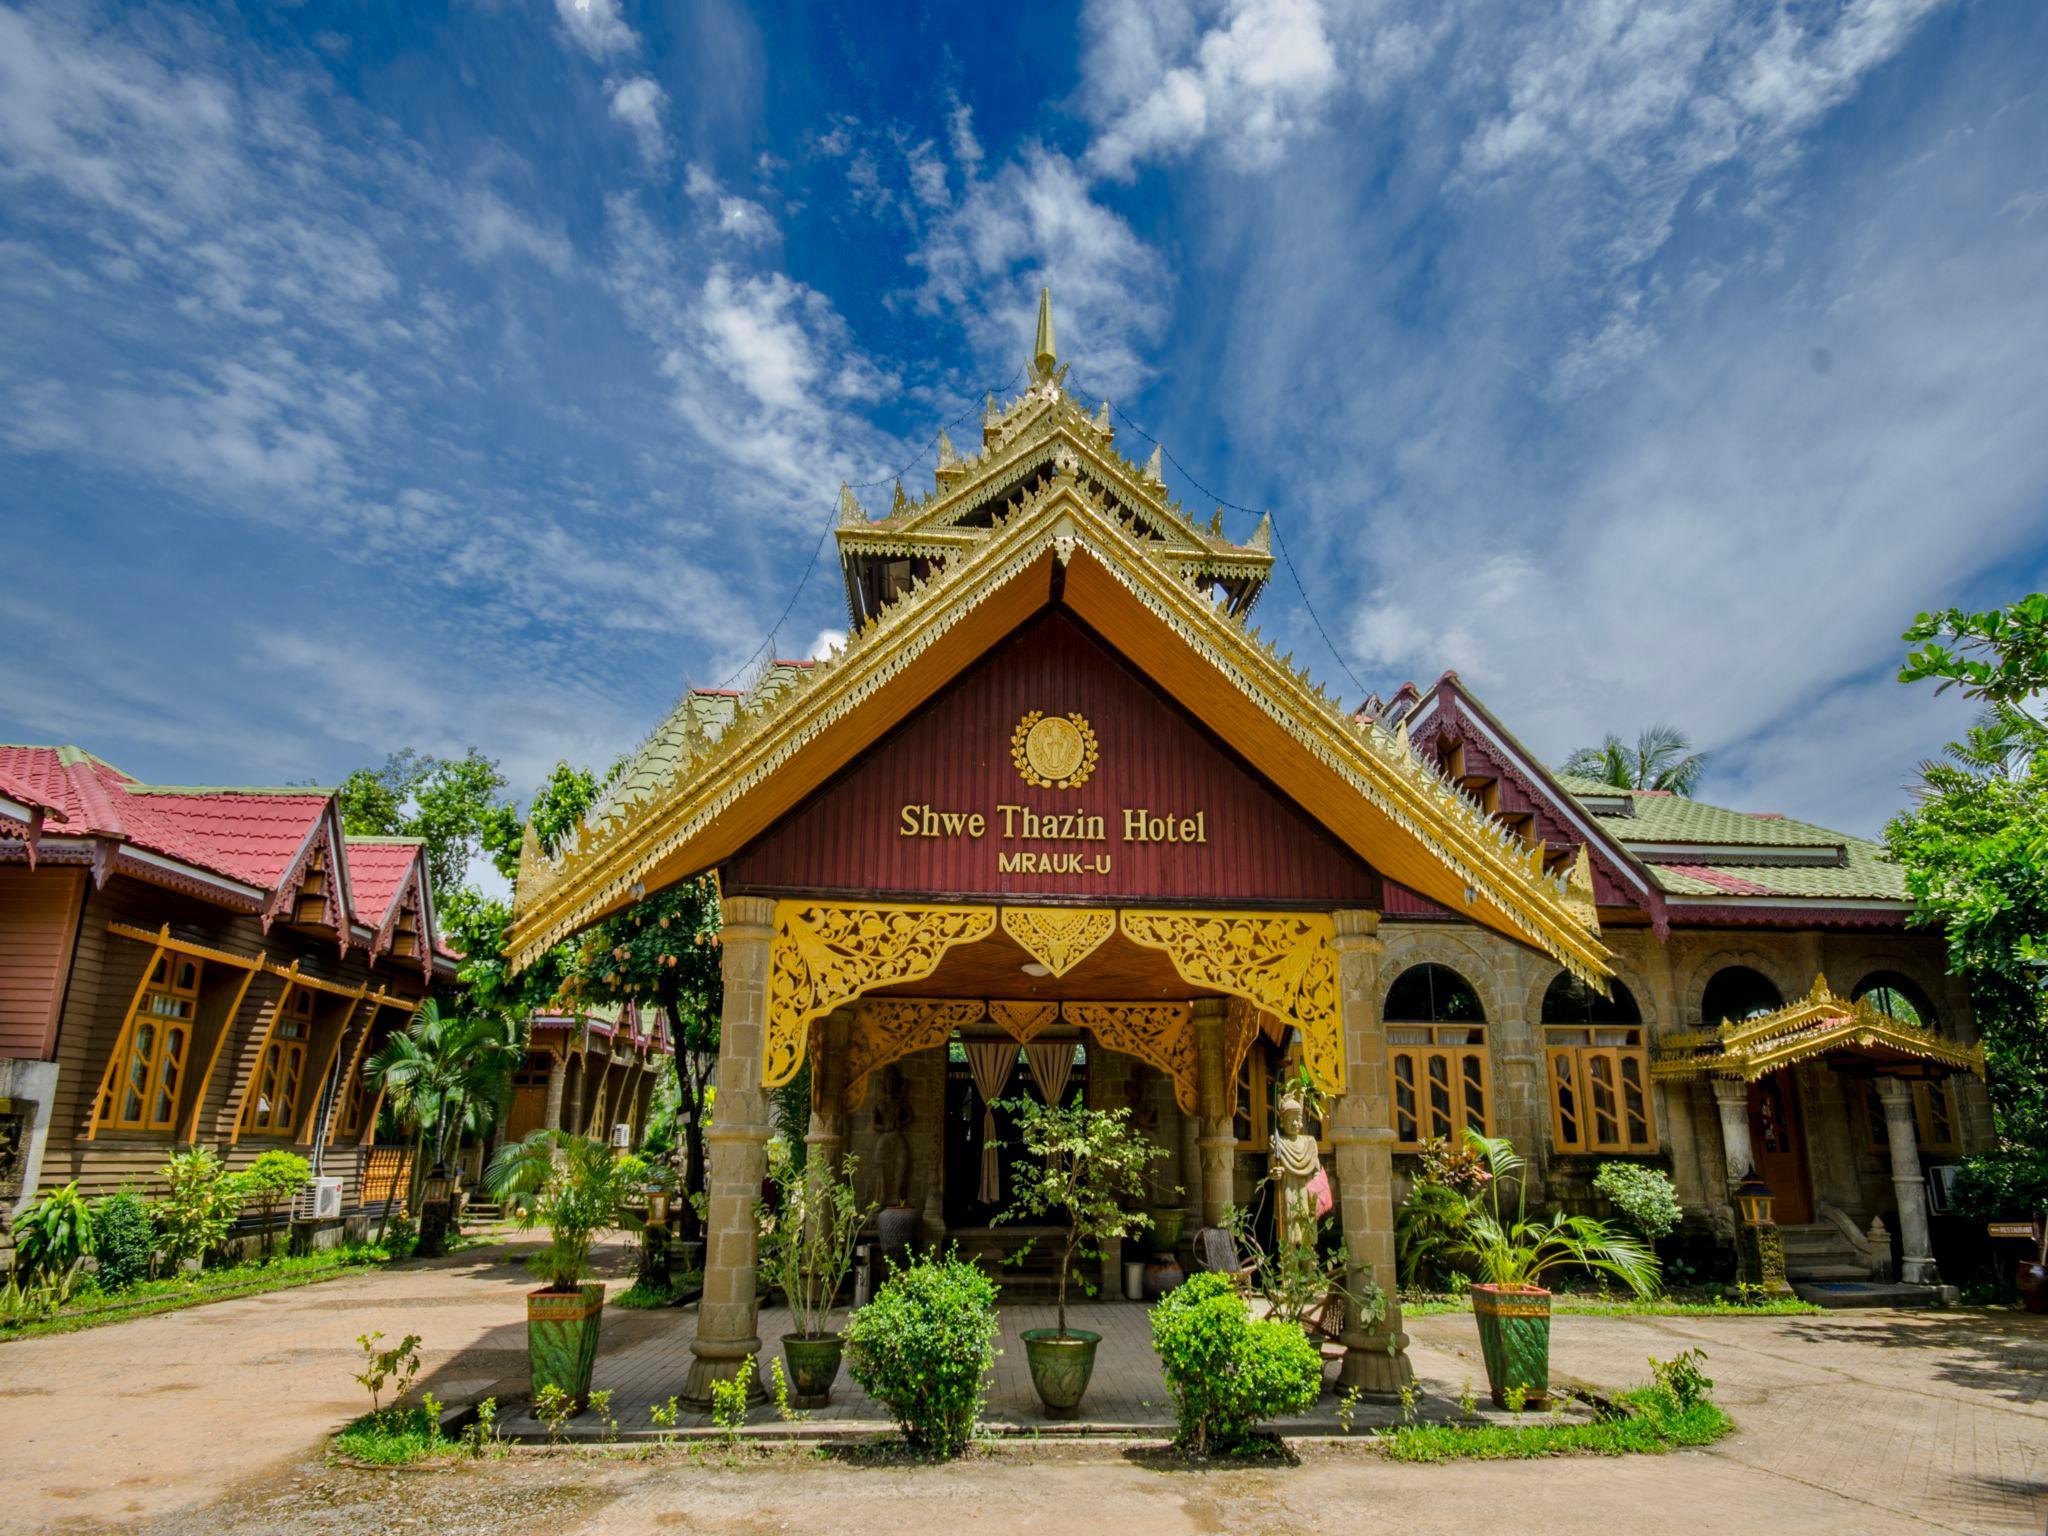 Shwe Thazin Hotel Mrauk U, Sittwe